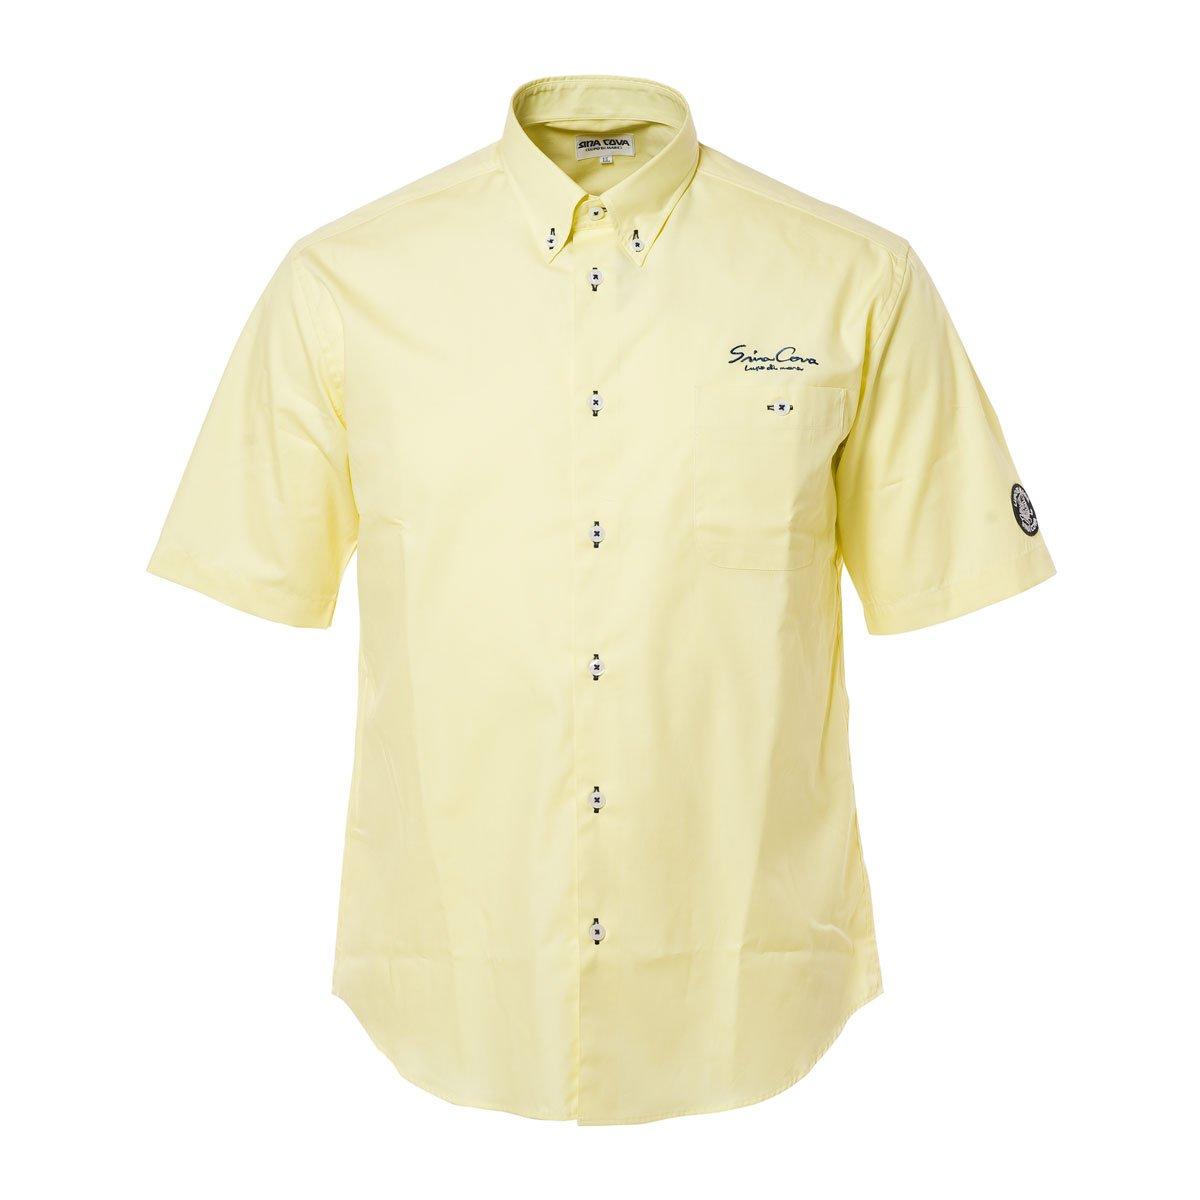 SINA COVA Men's Short Sleeve Shirt yellow Large Yellow by SINA COVA (Image #1)